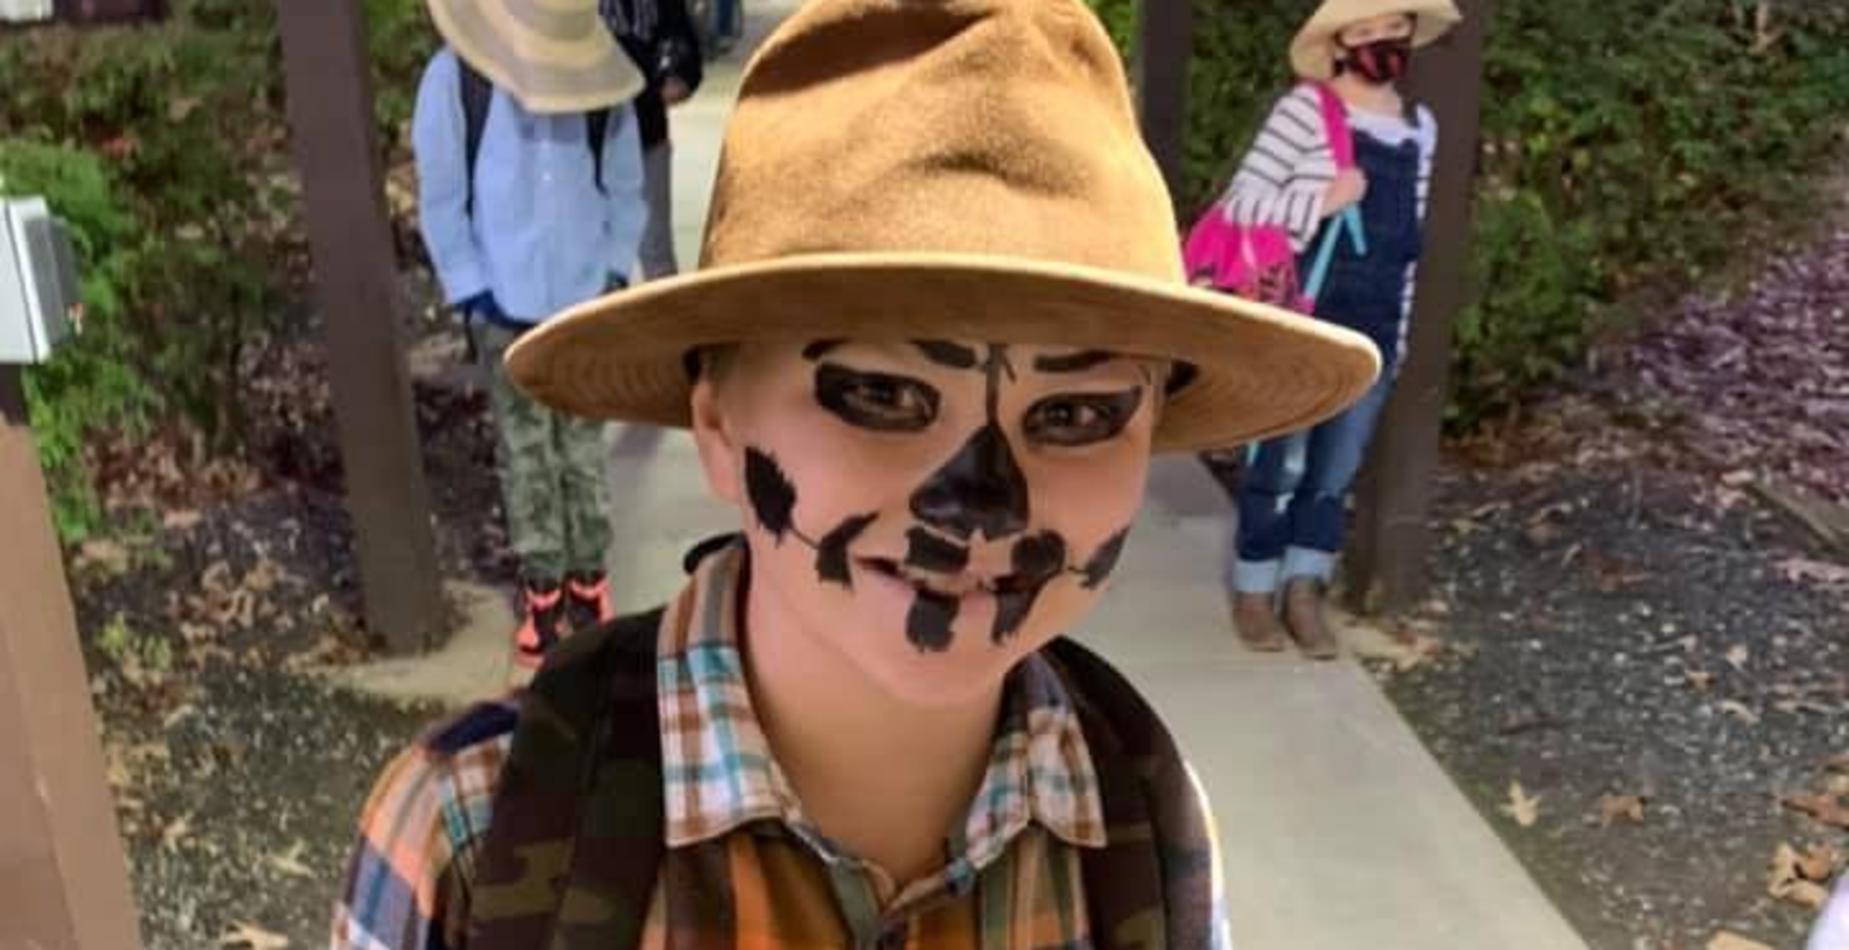 Student in scarecrow costume